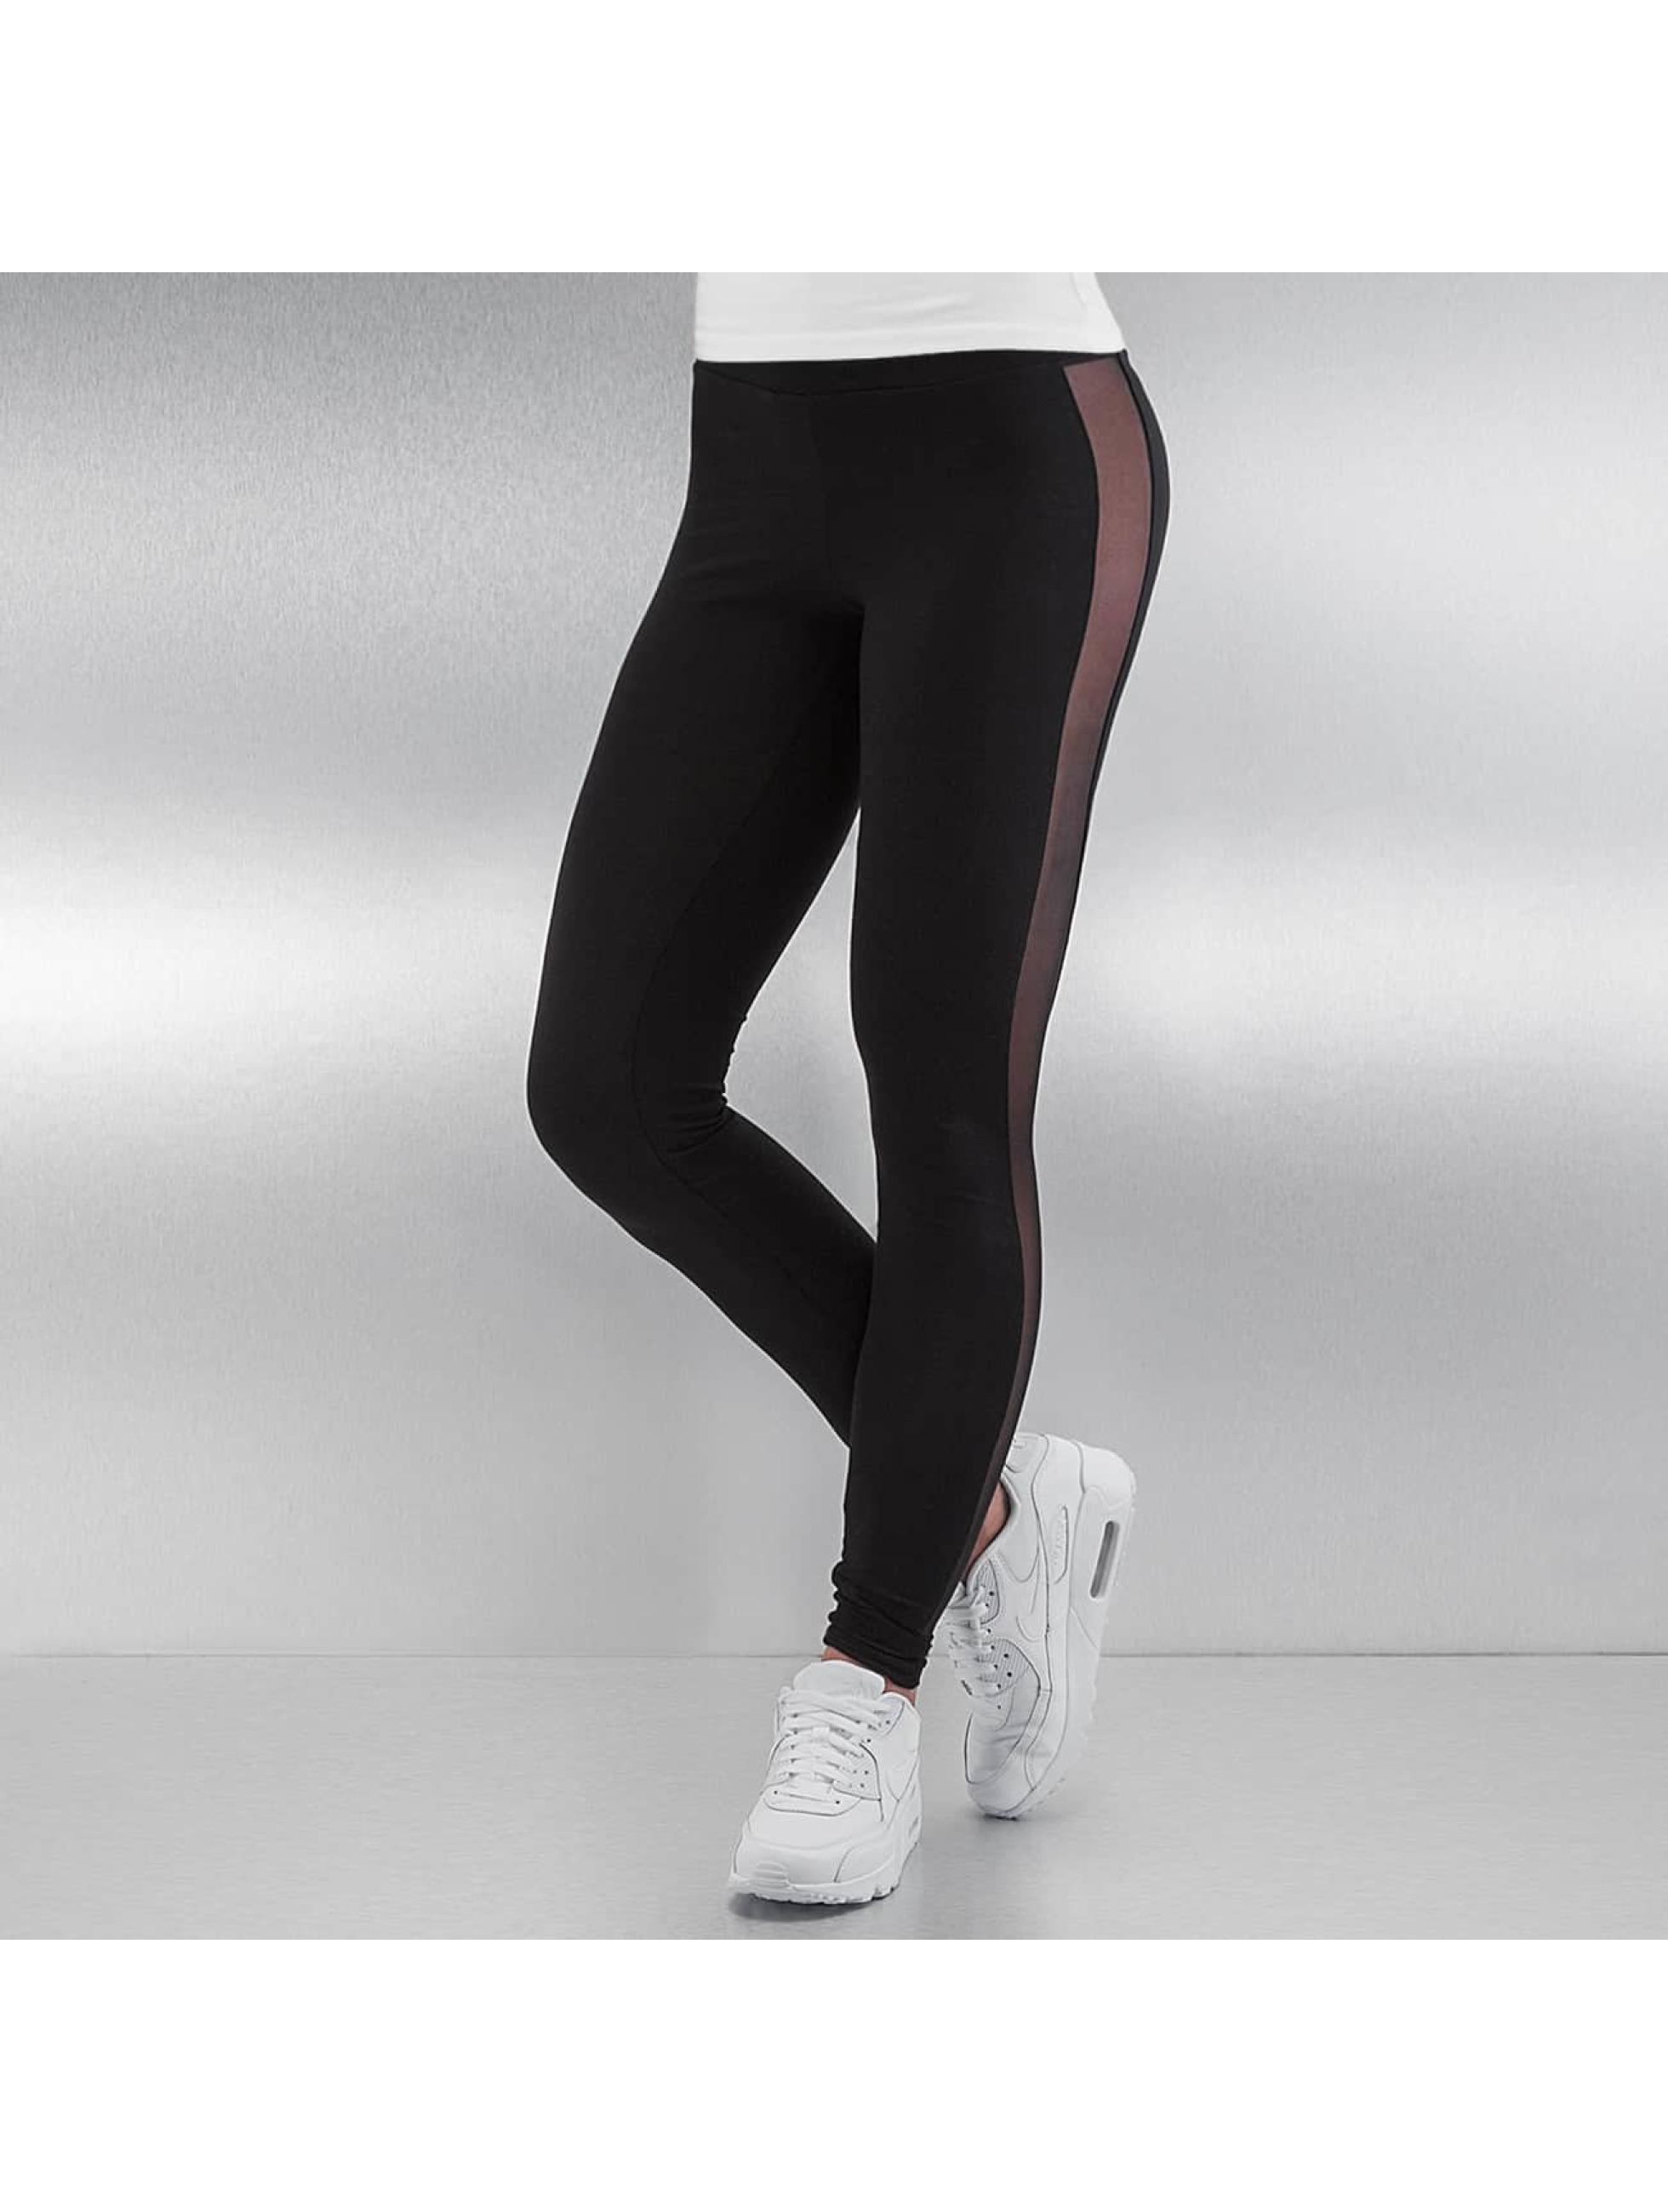 Legging Palila in schwarz